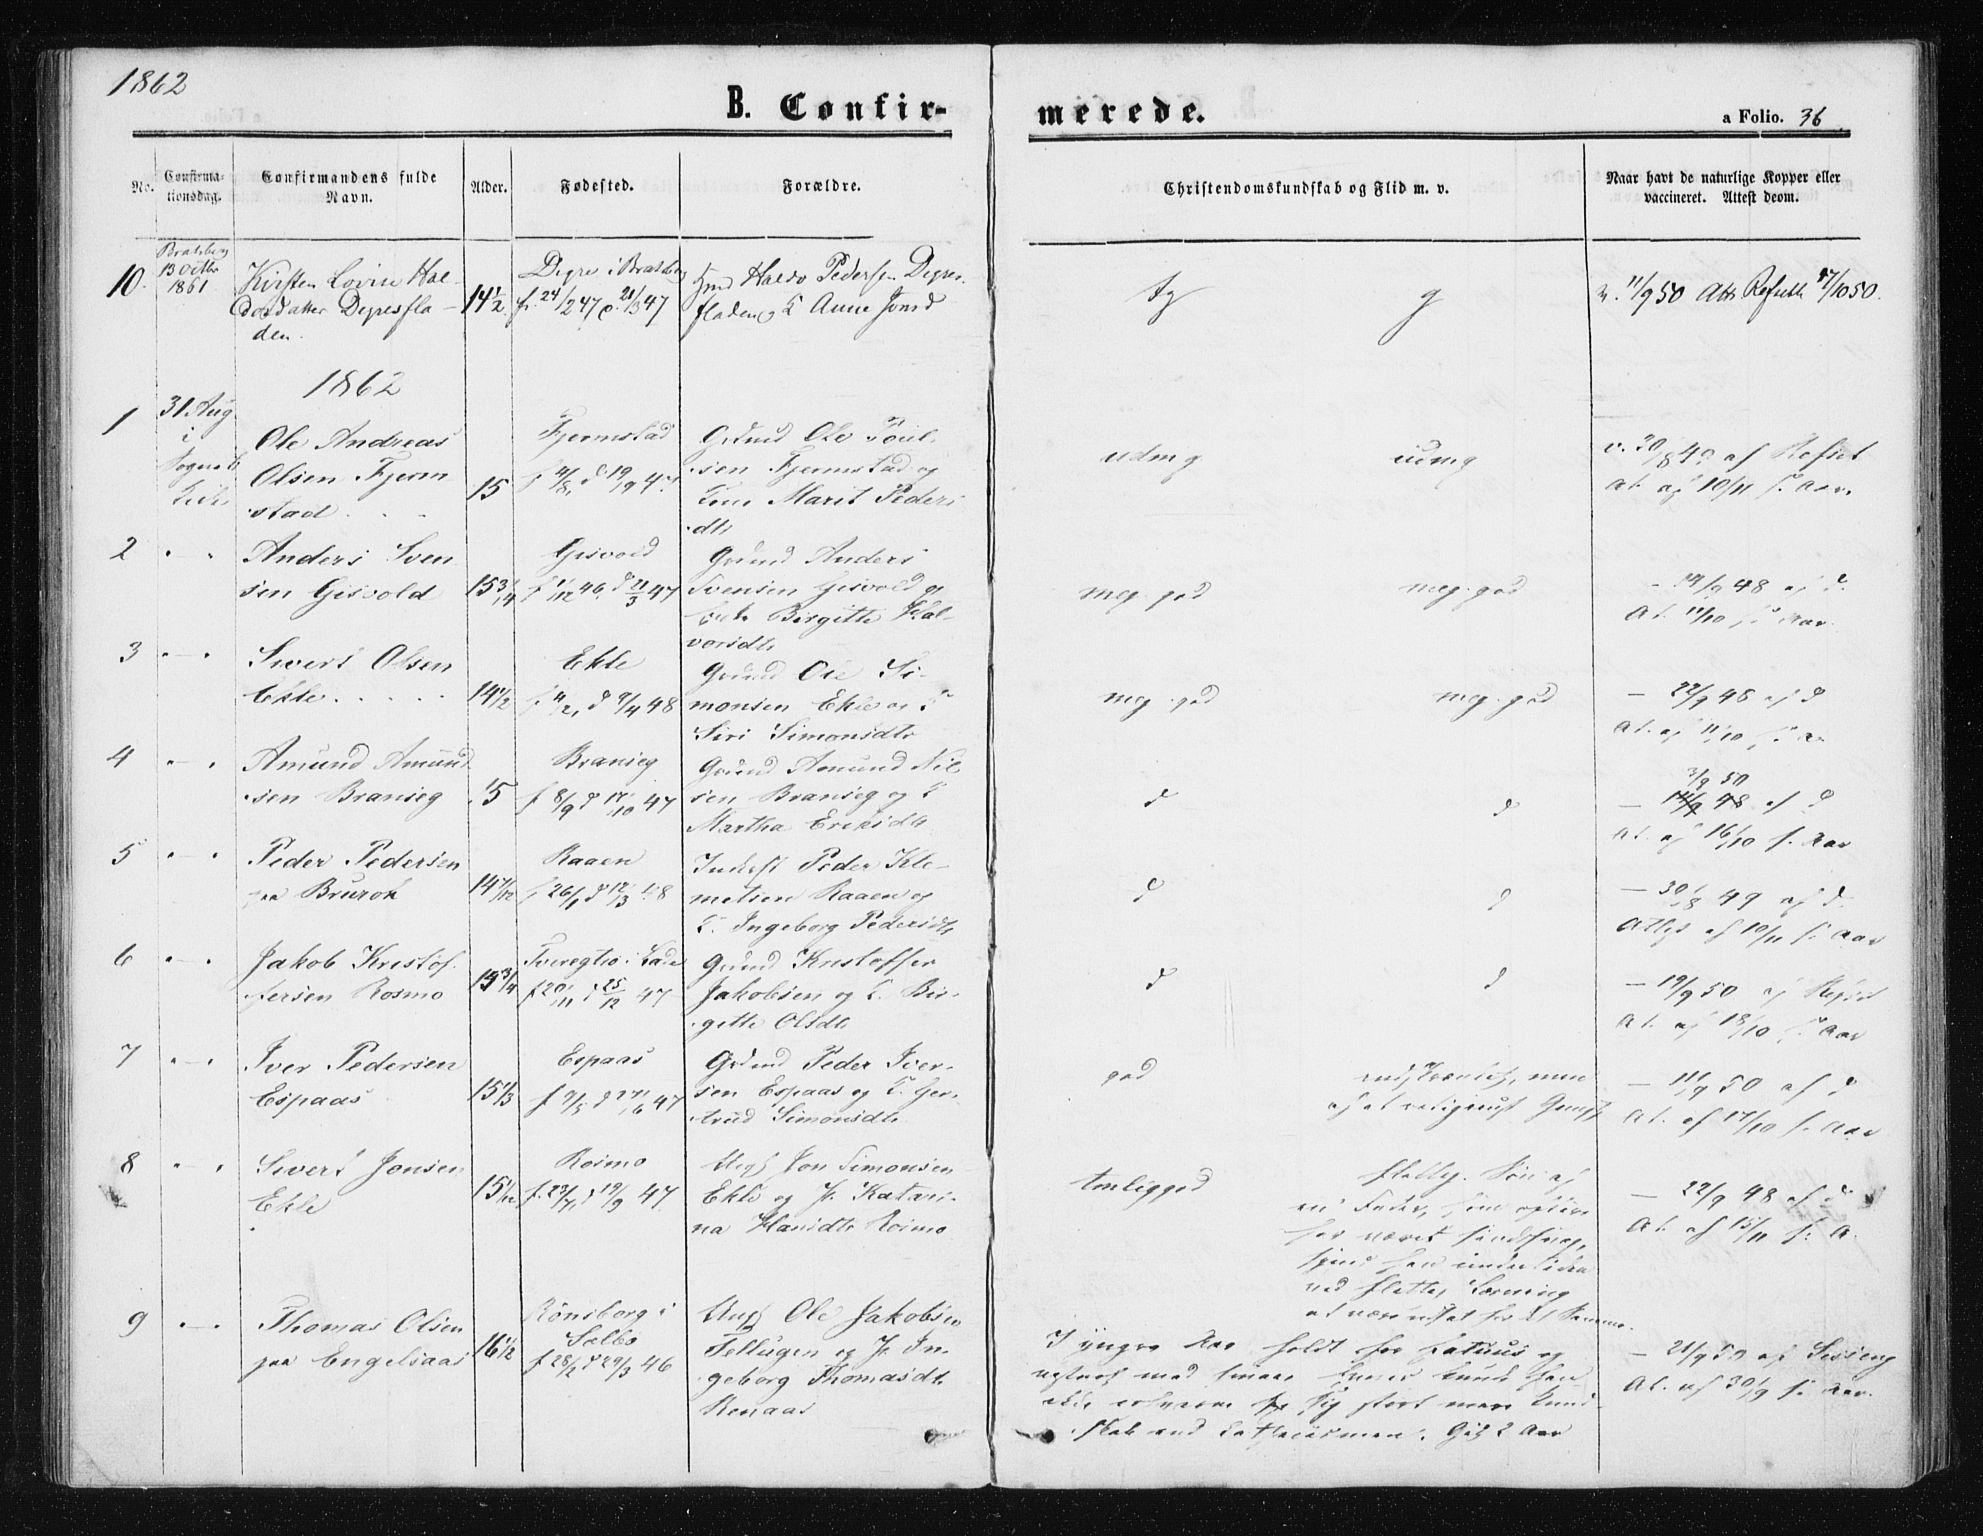 SAT, Ministerialprotokoller, klokkerbøker og fødselsregistre - Sør-Trøndelag, 608/L0333: Parish register (official) no. 608A02, 1862-1876, p. 36